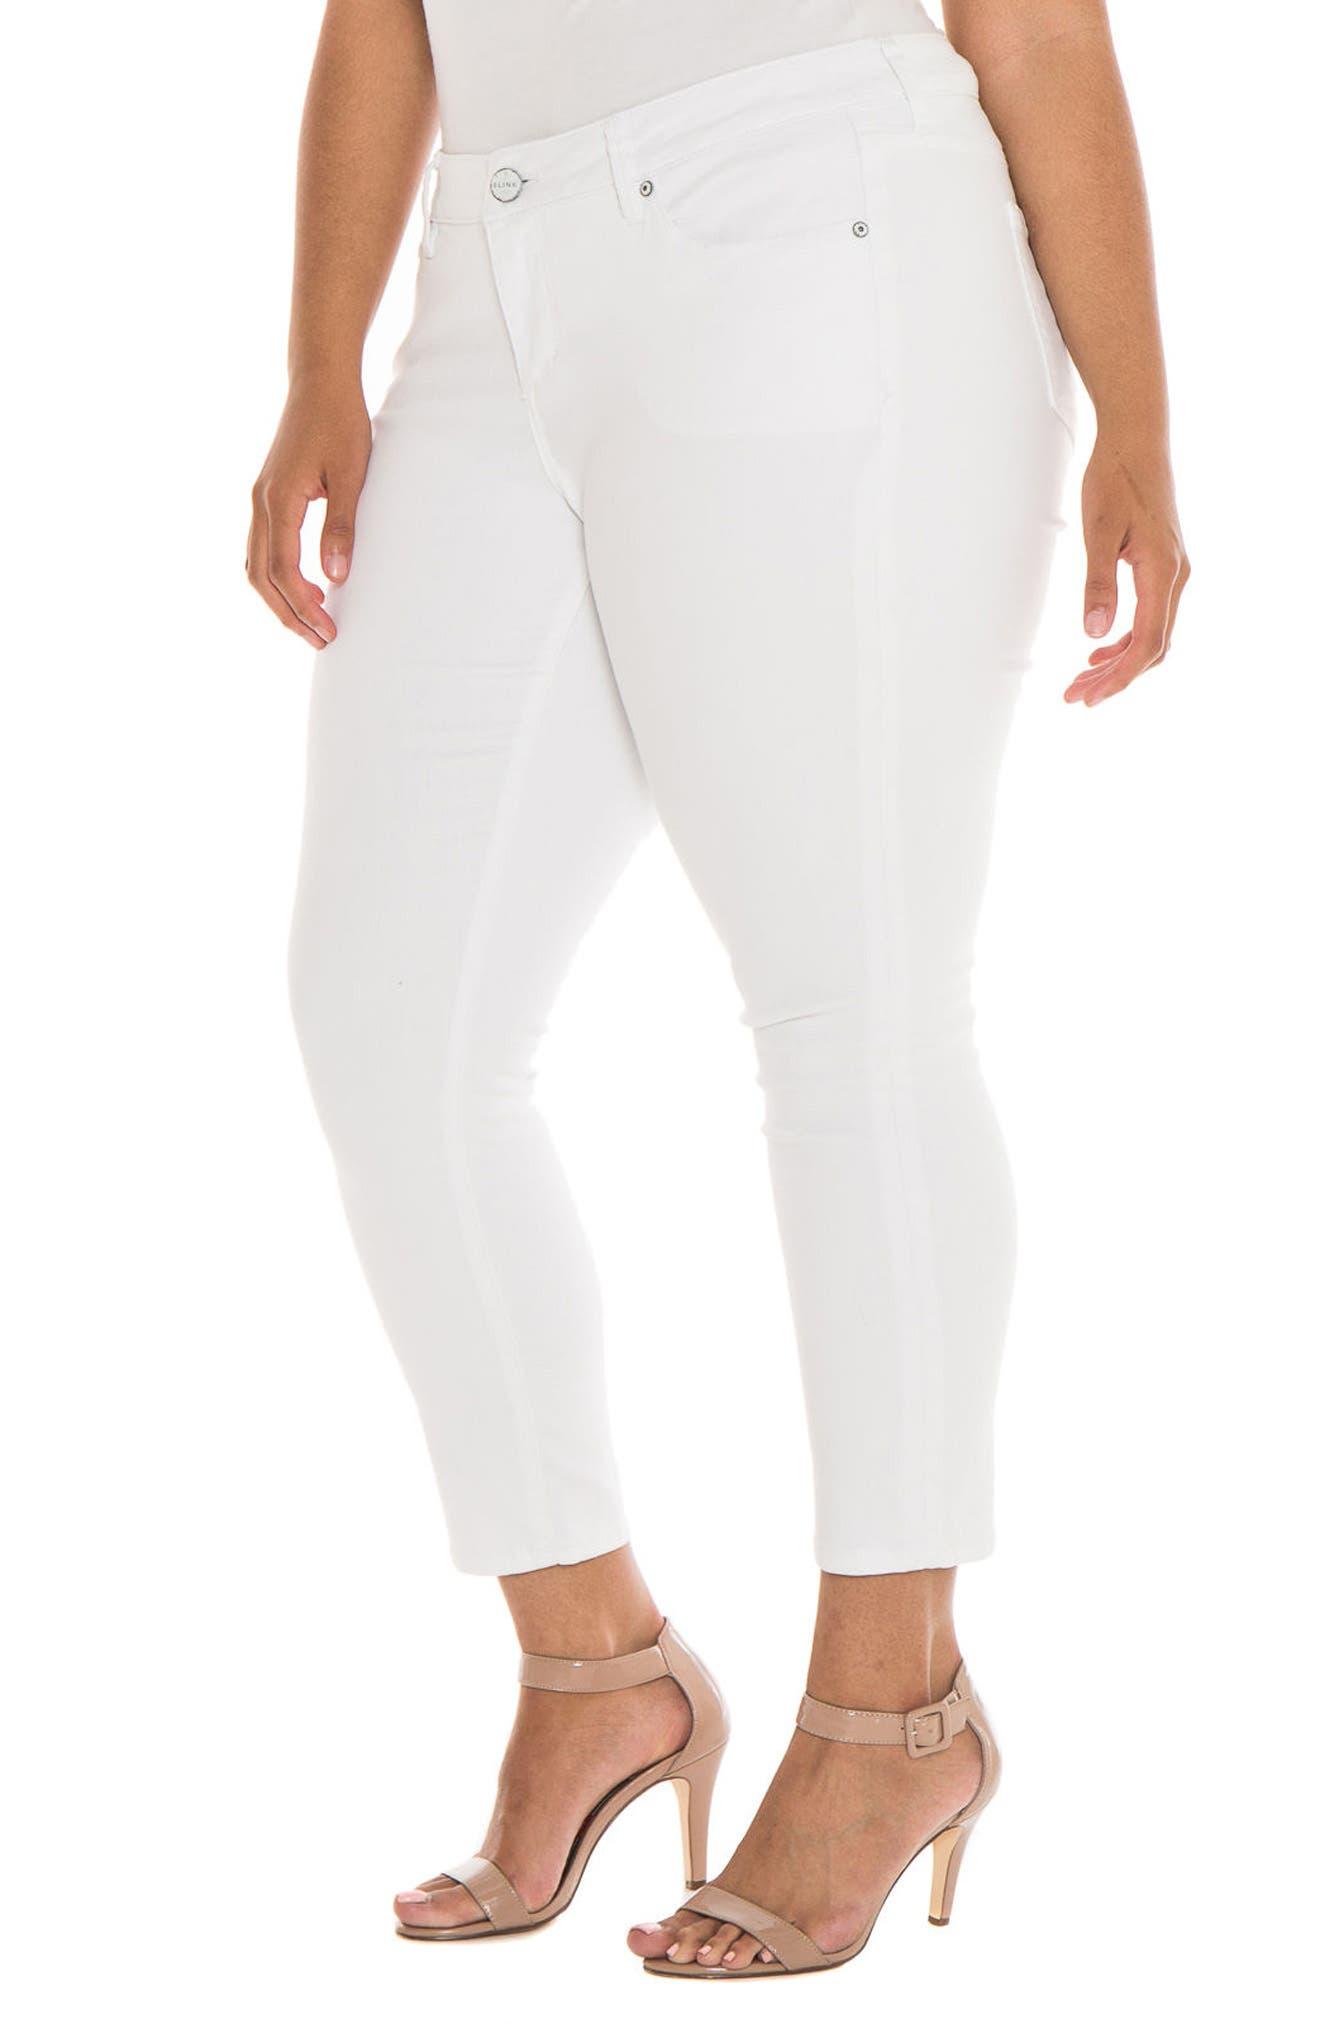 SLINK Jeans Stretch Skinny Jeans (Charlie) (Plus Size)